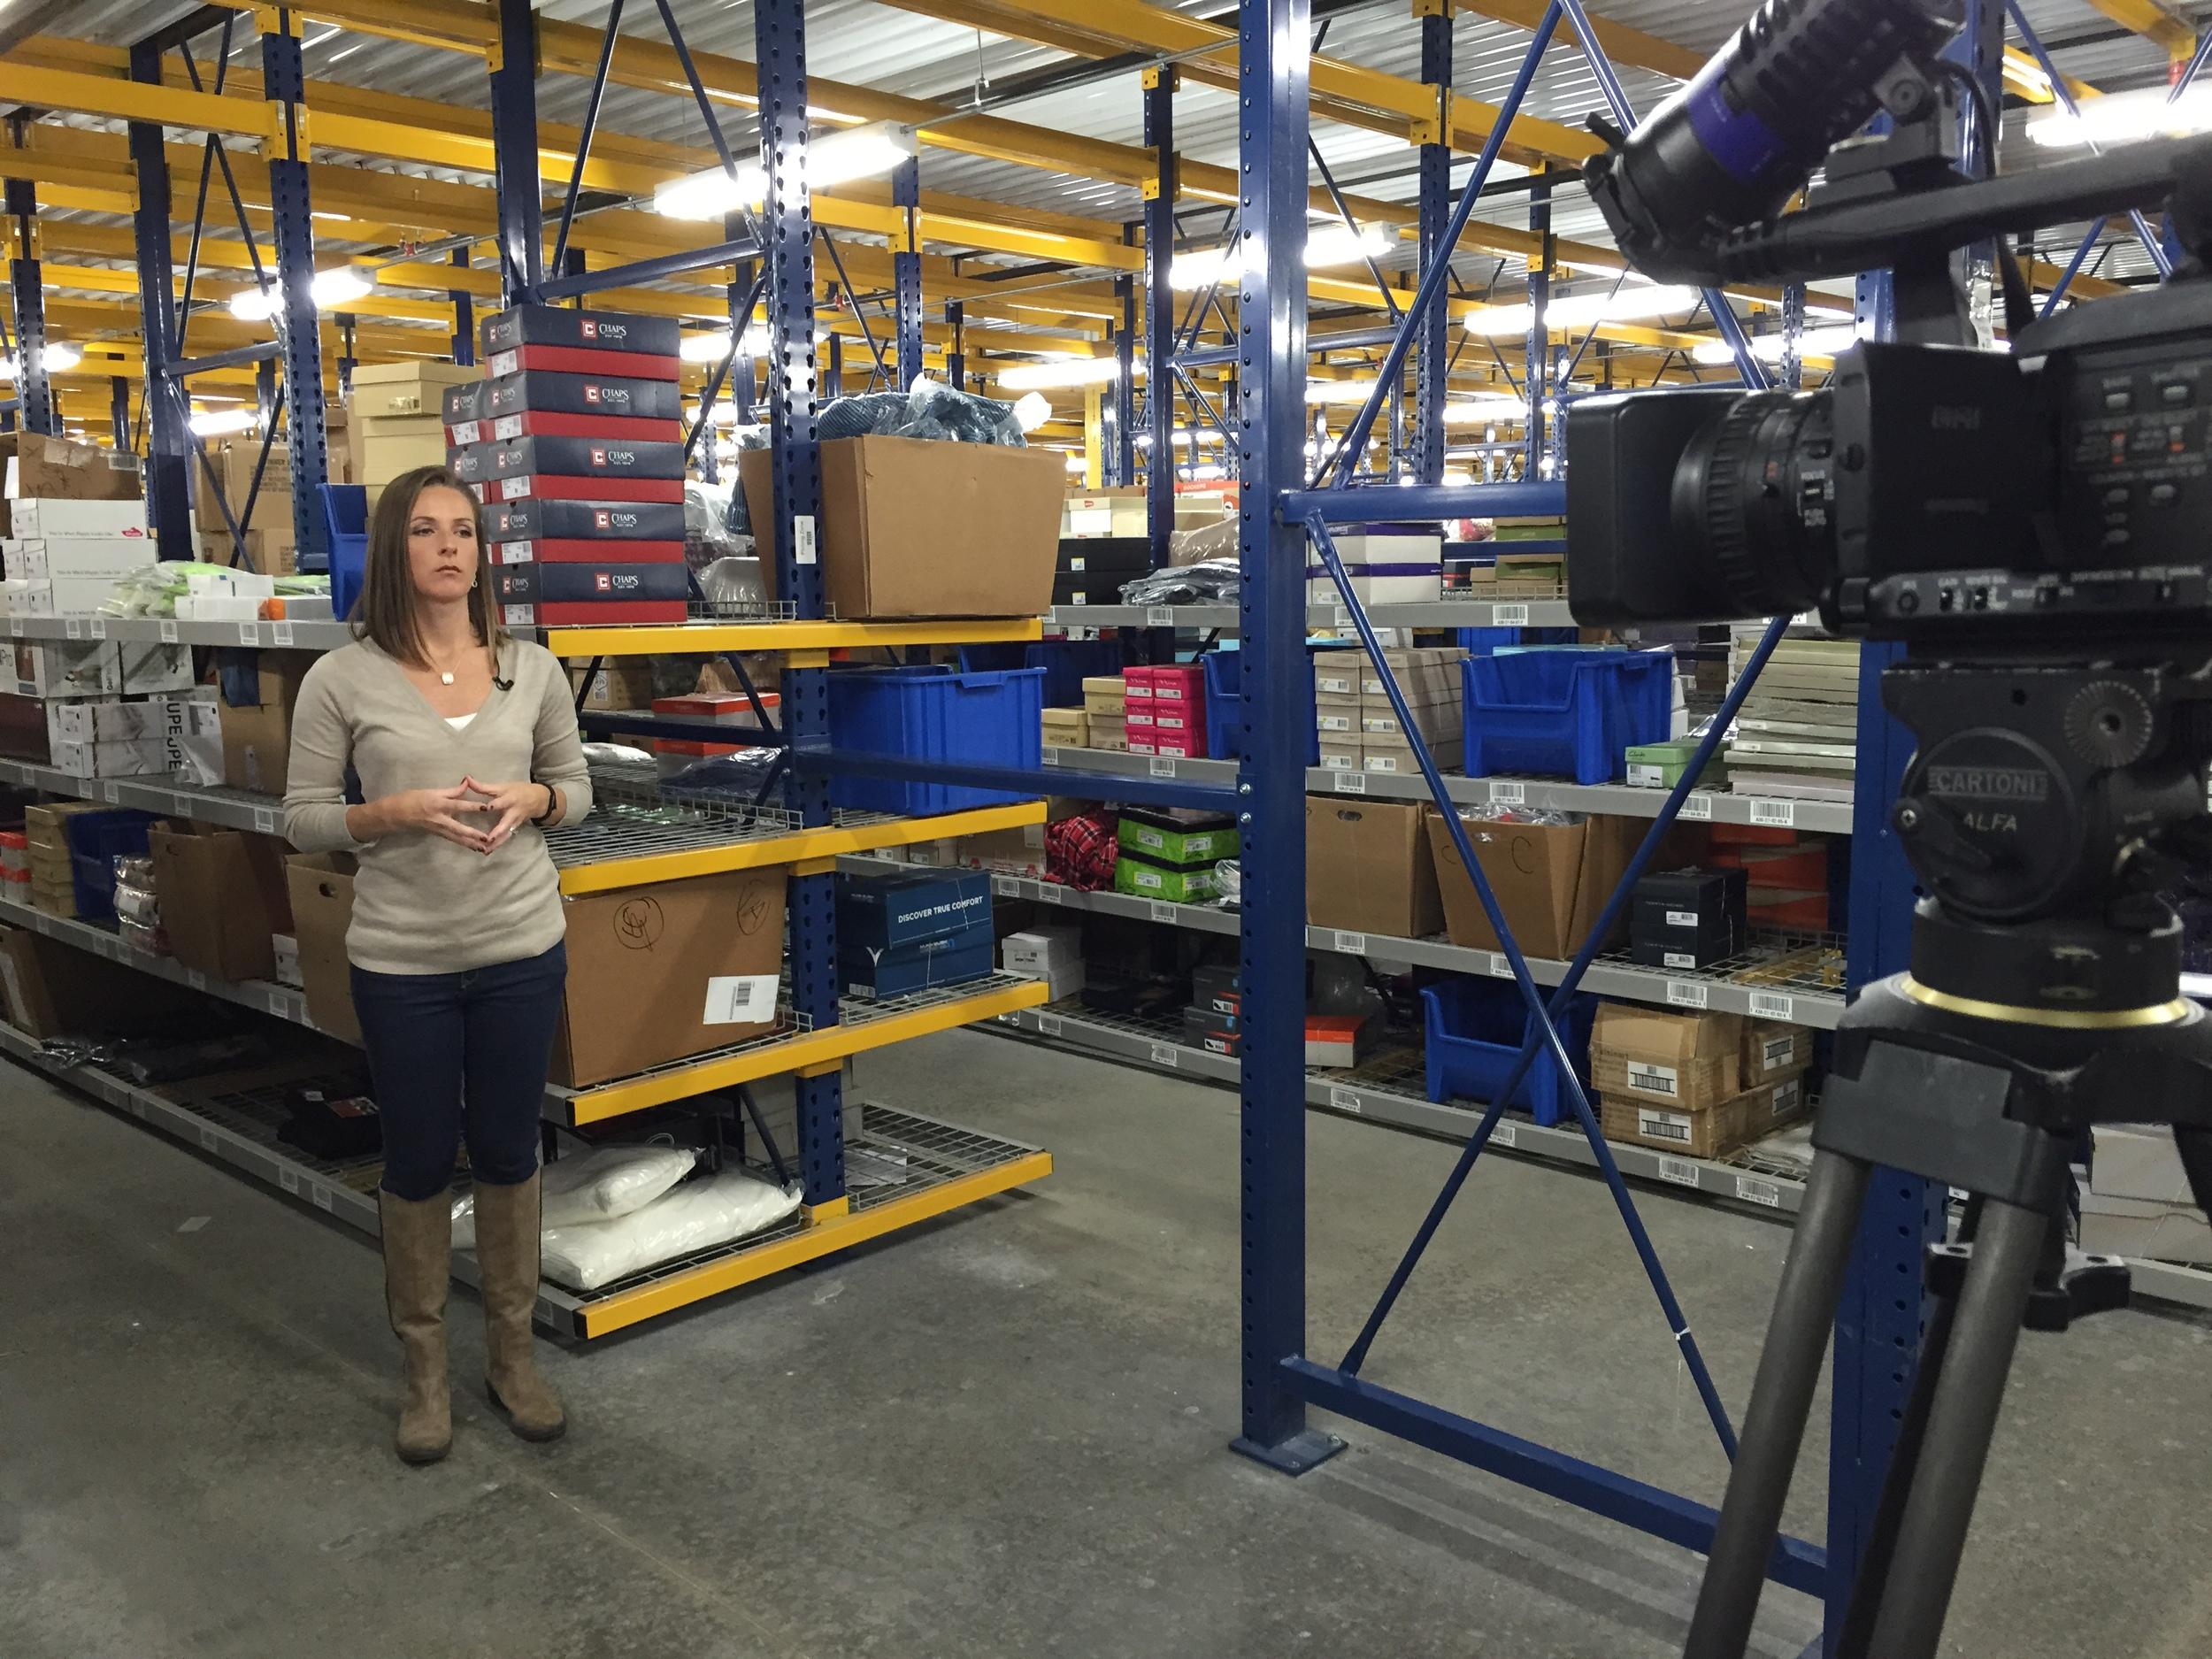 Time Warner Cable News reporter, Kate Gaier, on site at Belk's distribution center.